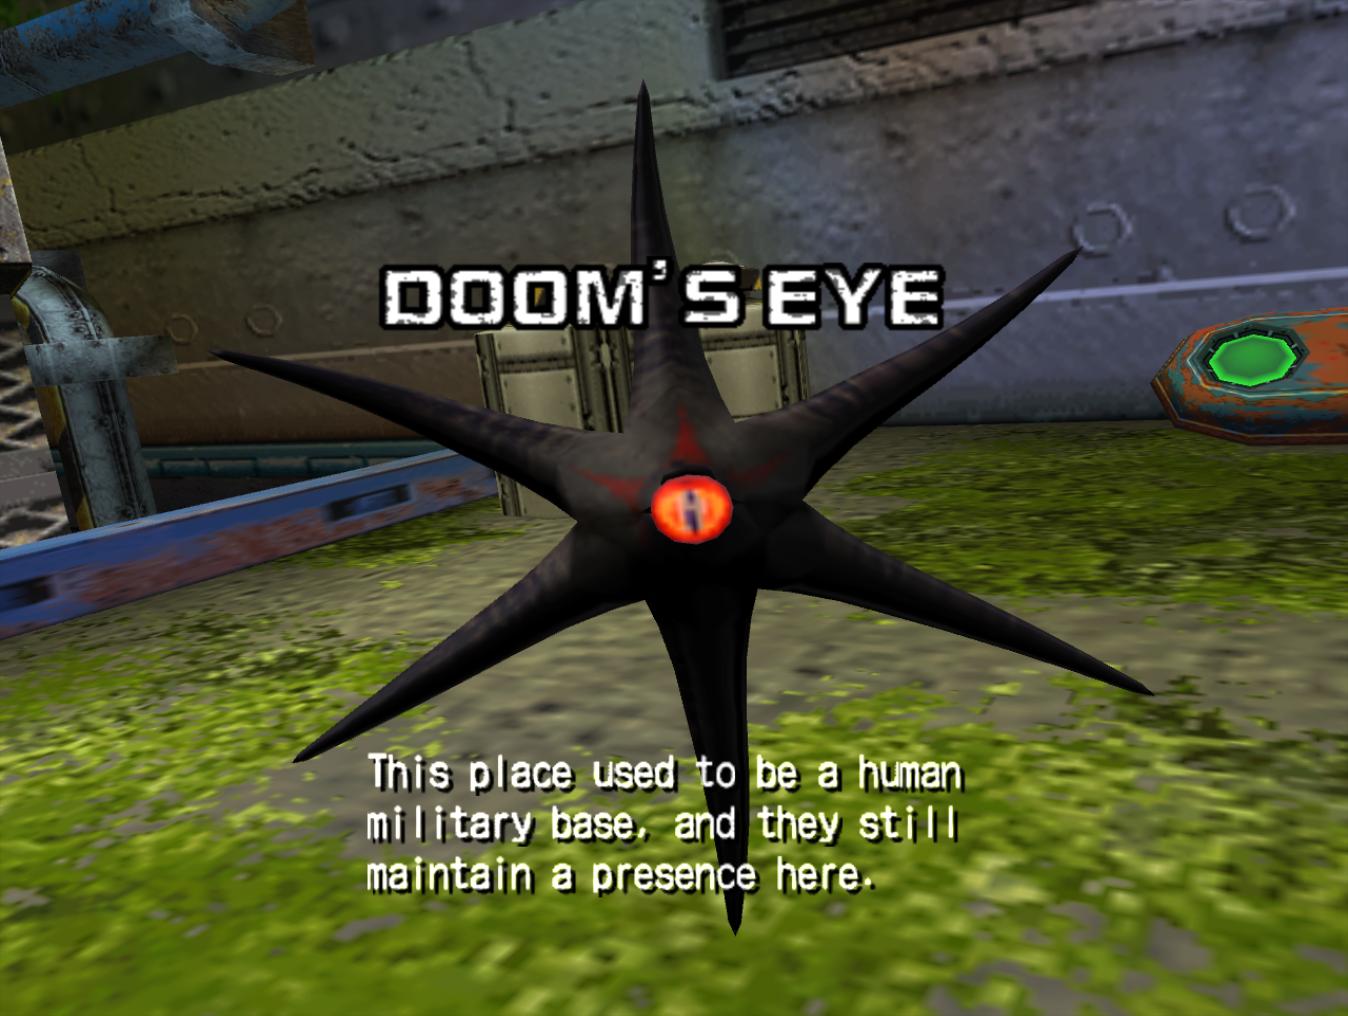 File:Doom's Eye - Prison Island.png